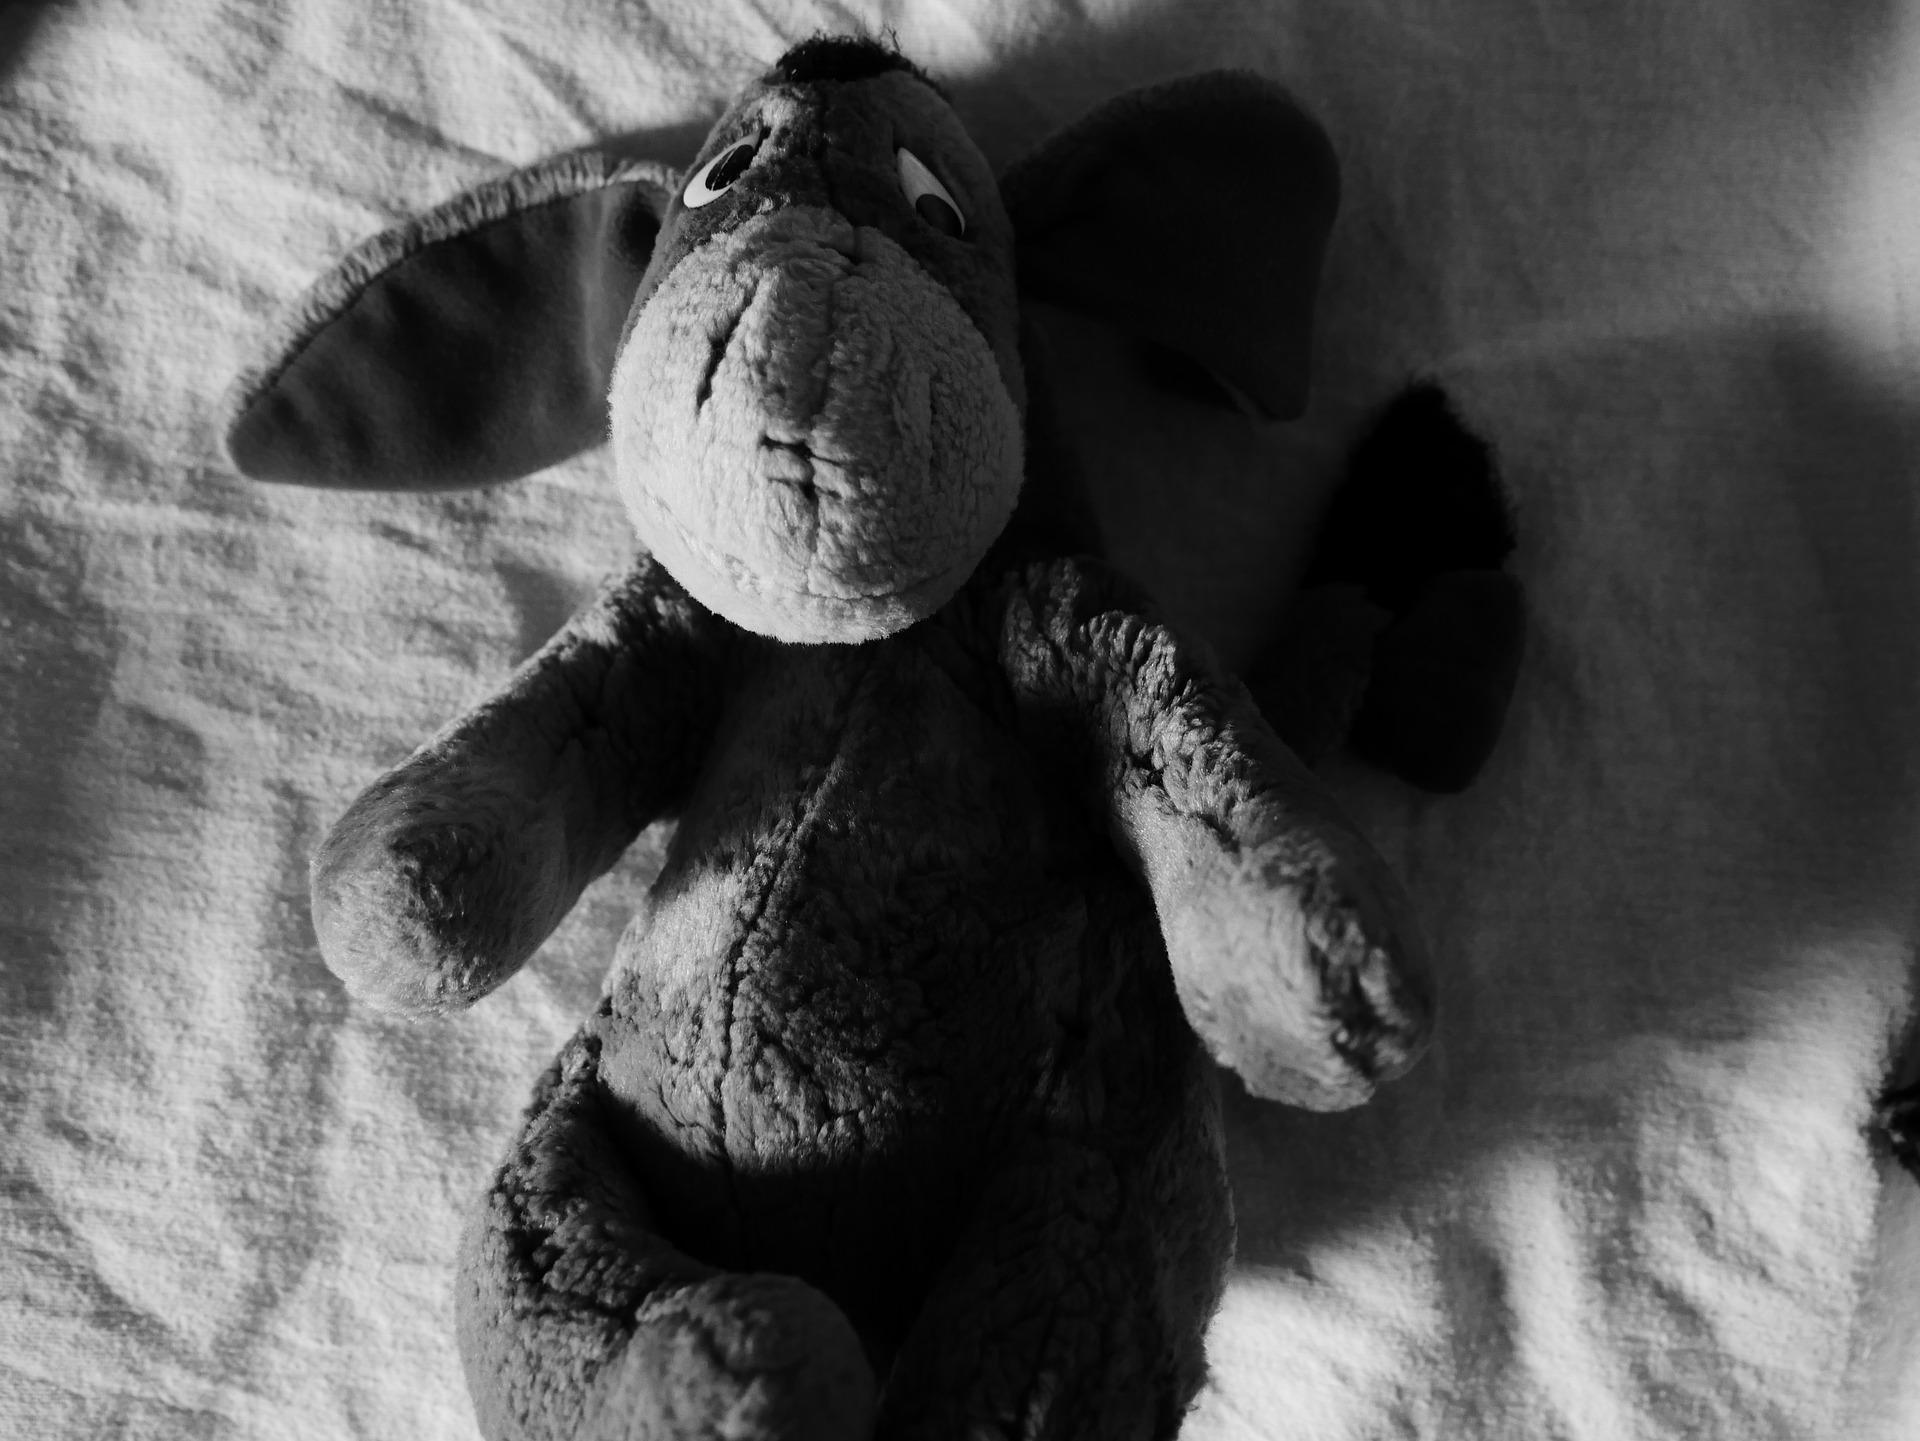 The Eeyore Syndrome - Understanding Self-Deprecation